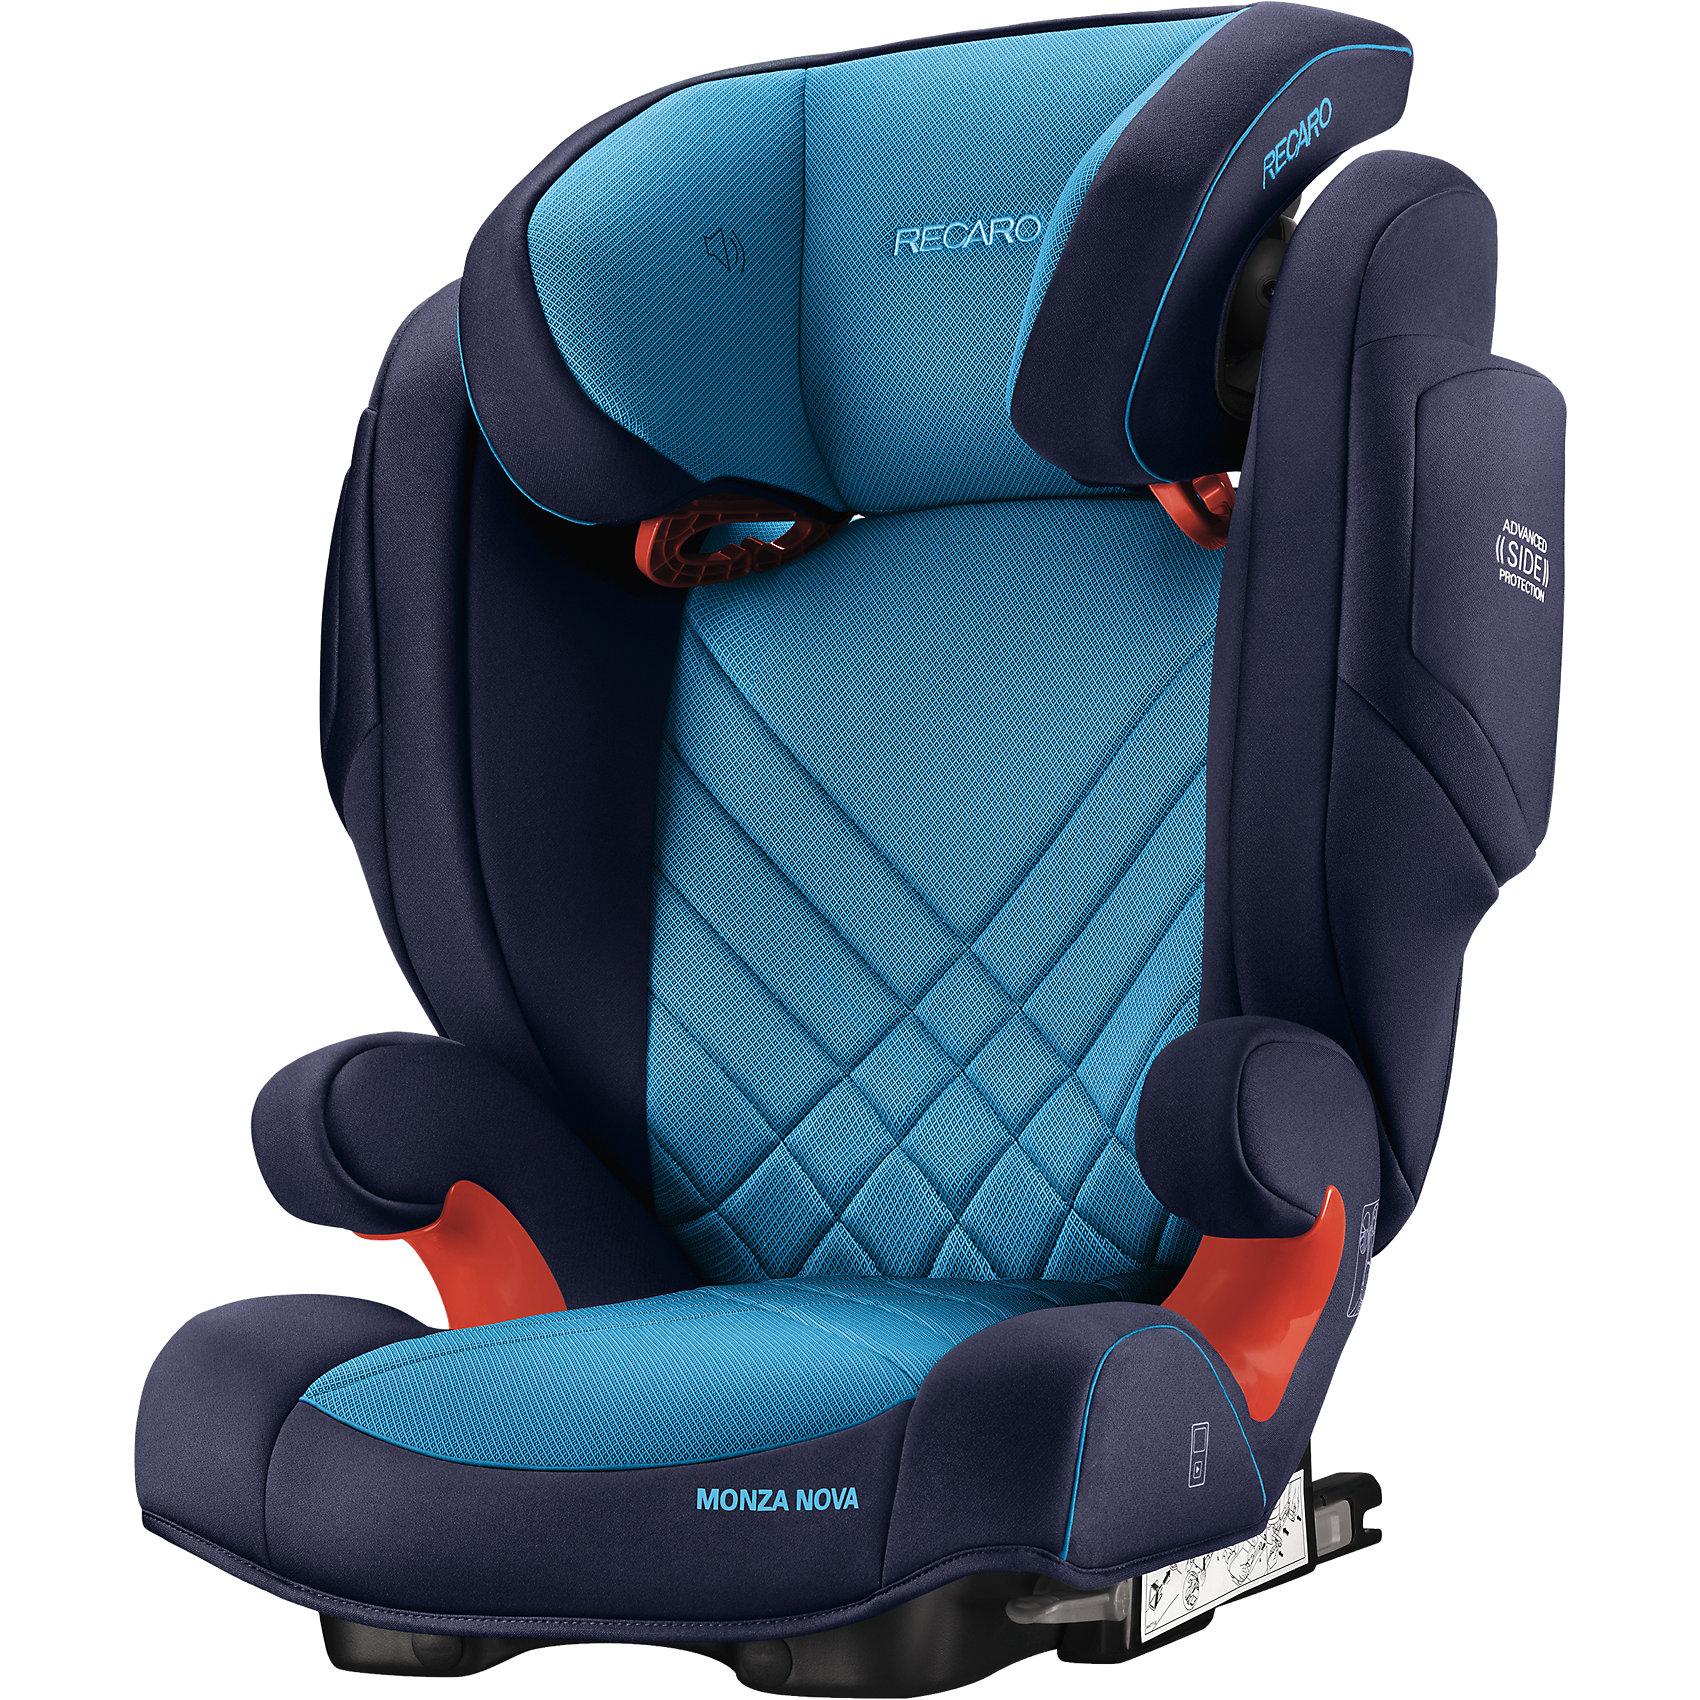 RECARO Автокресло Monza Nova 2 SF,  15-36 кг, Recaro, xenon blue автокресло recaro monza nova 2 seatfix 15 36 кг perfomance black